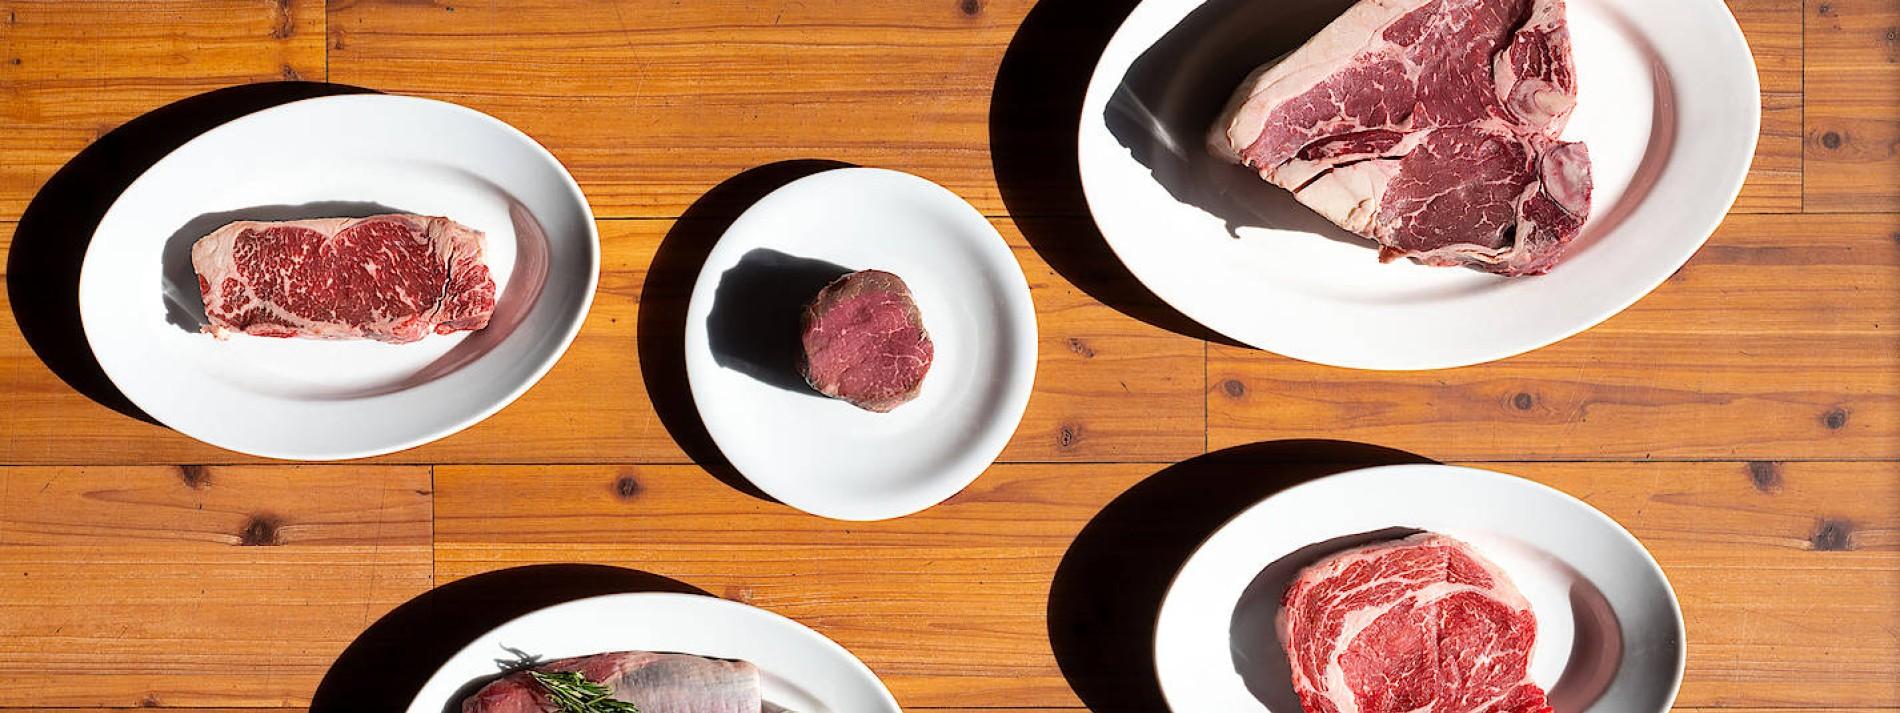 Filet Mignon mit Safari-Touch